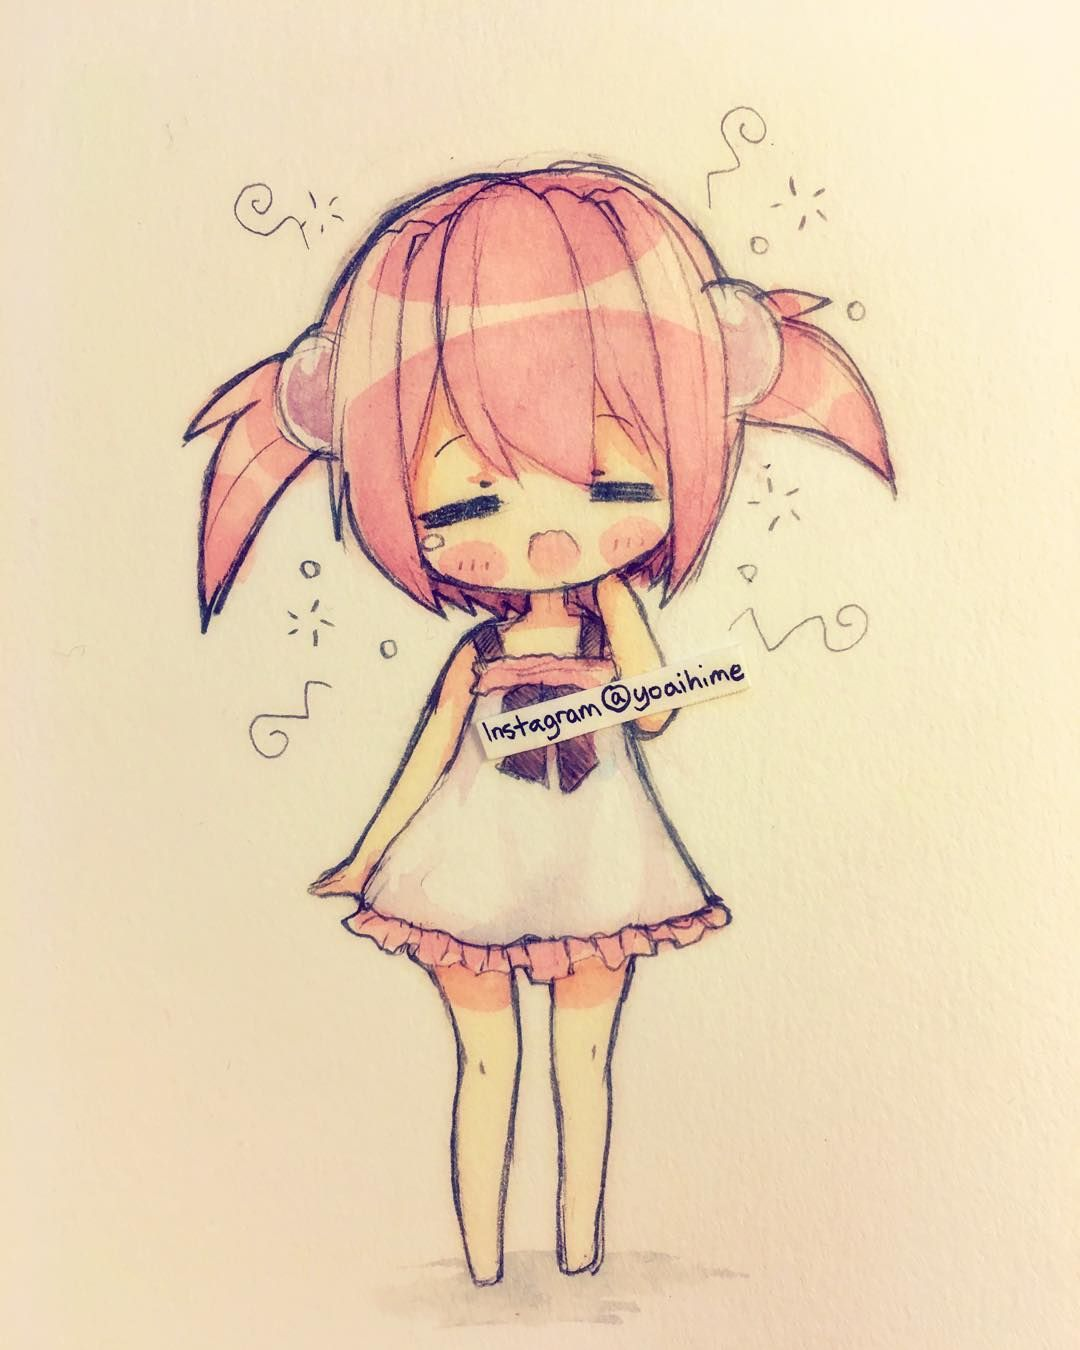 chibi anime characters drawings